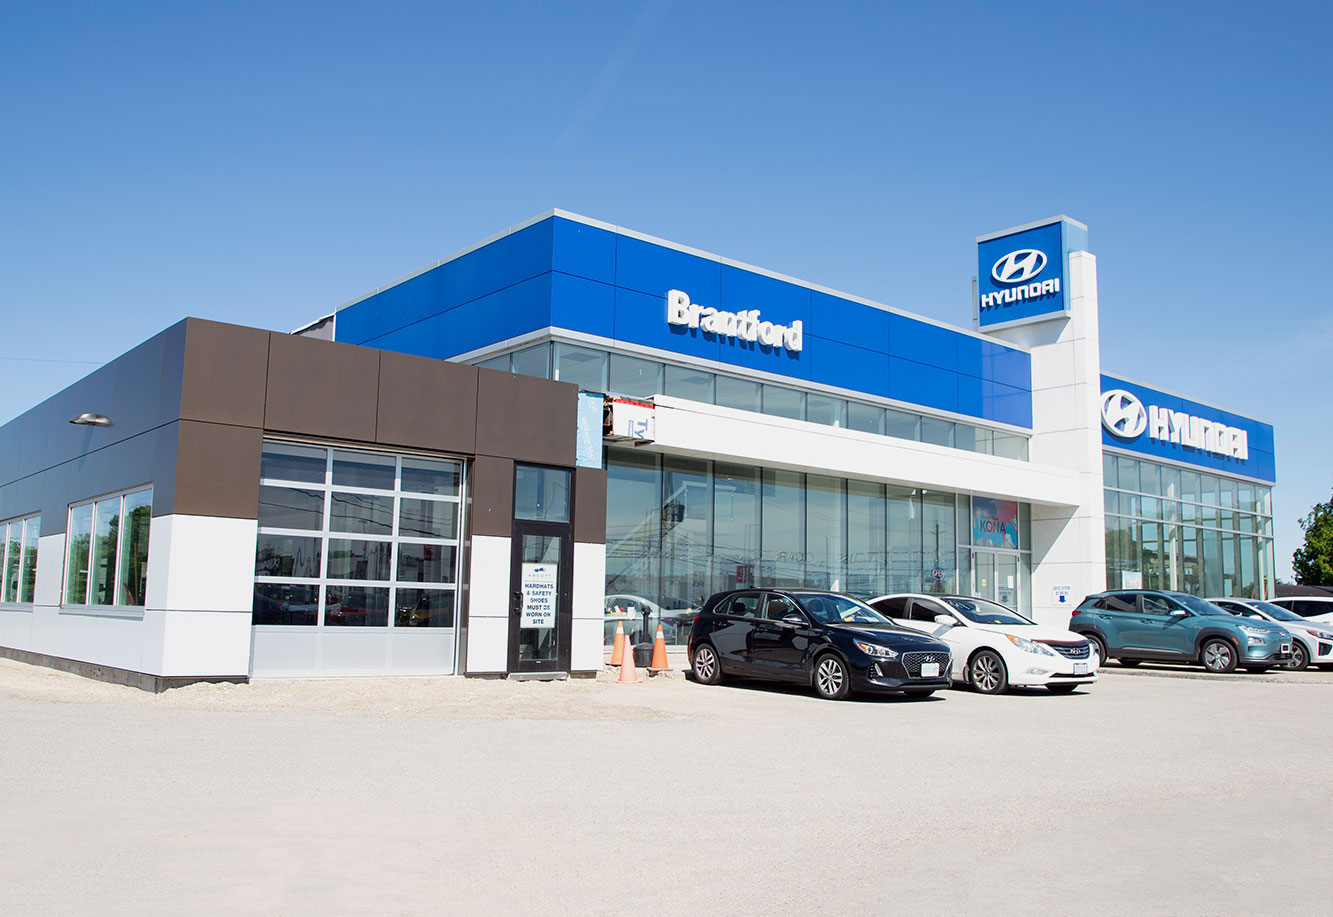 Brantford Hyundai